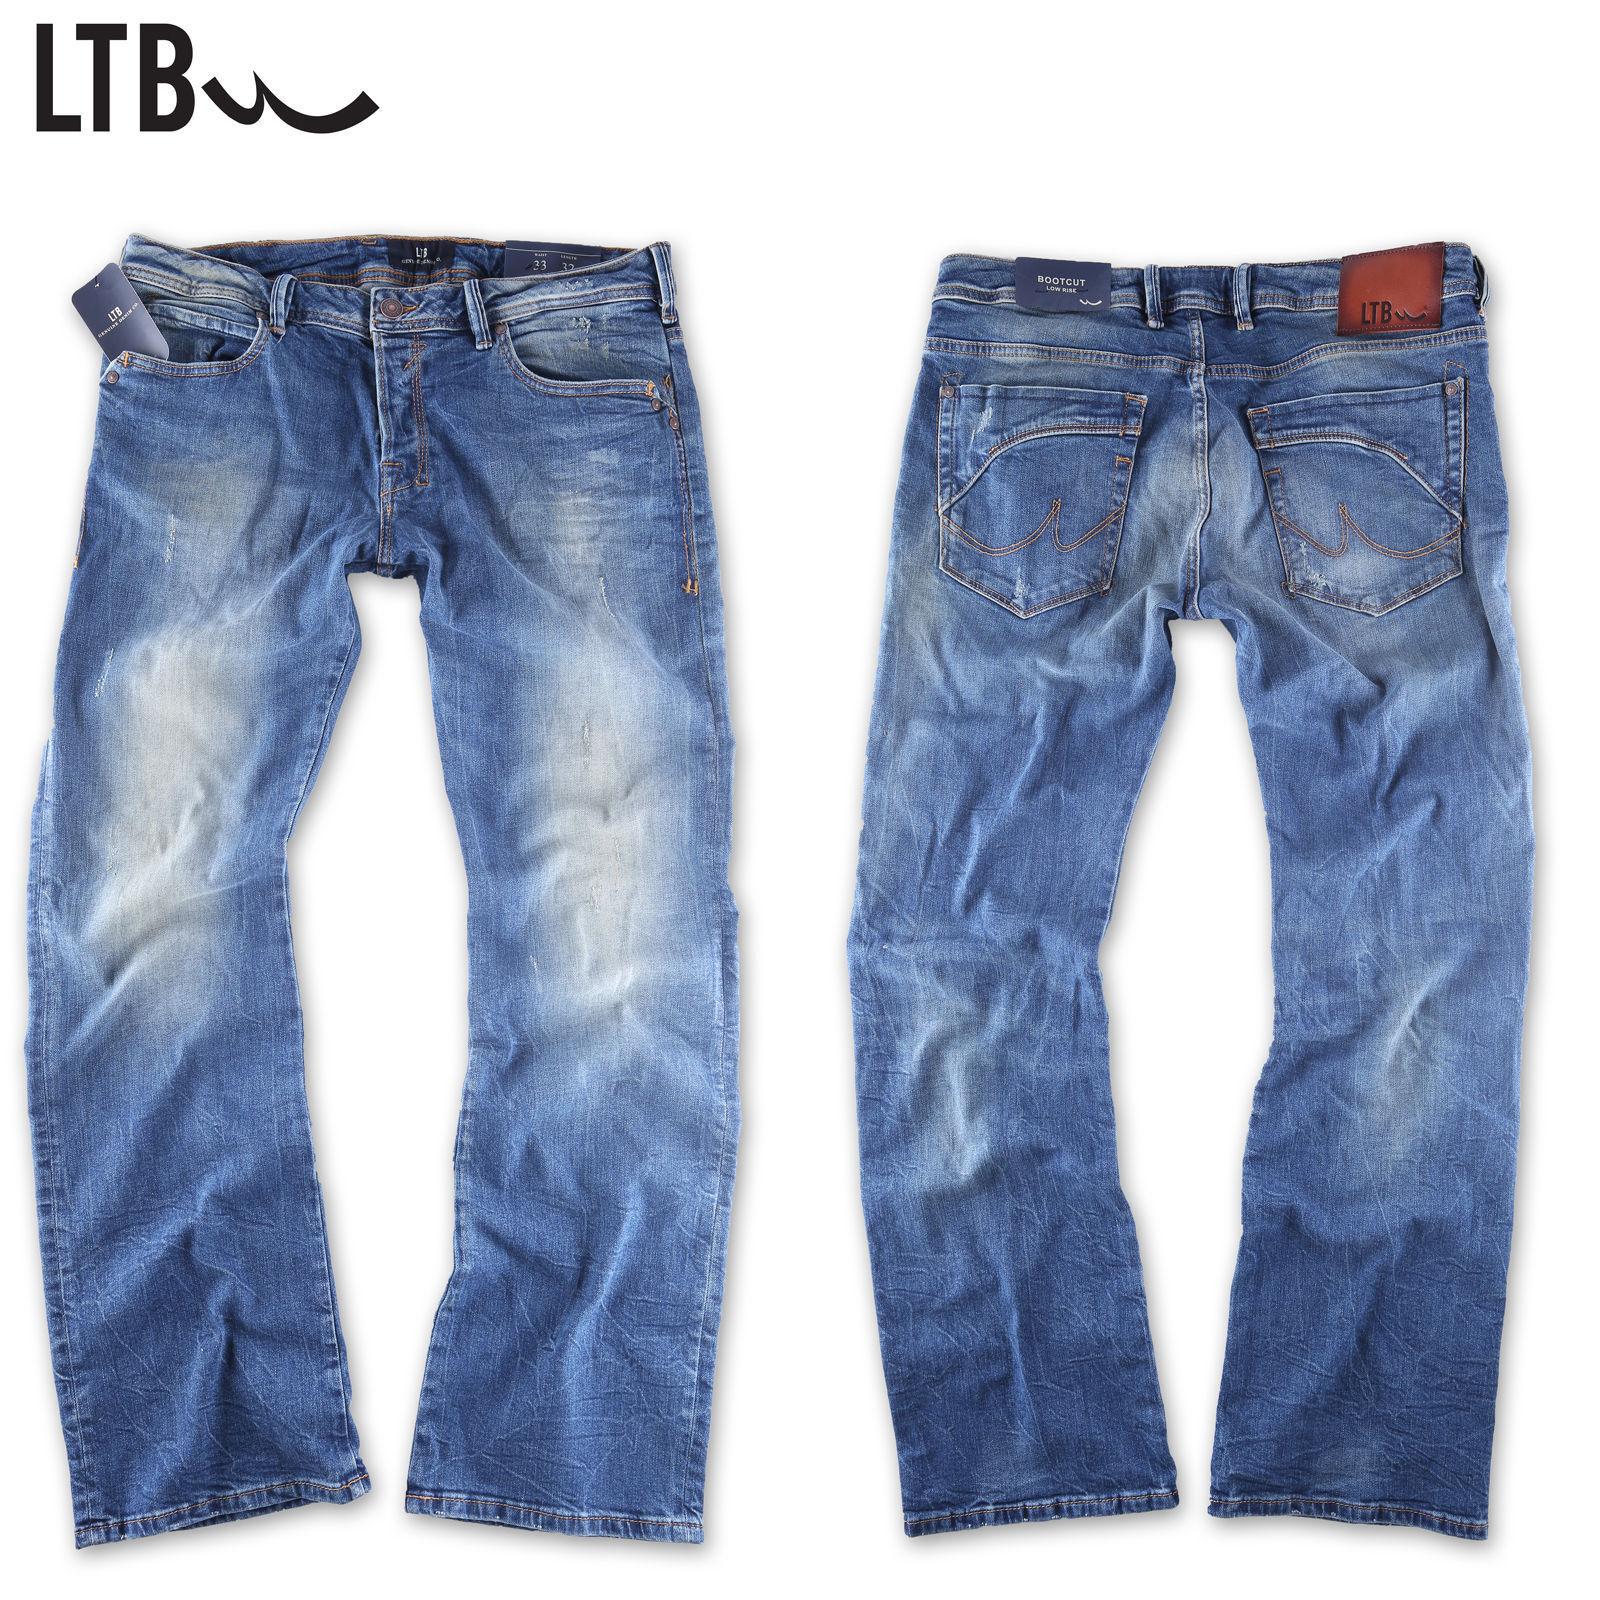 LTB Herren Jeans Hose Roden Timor Blau wash Neu Neu Neu Grössen wählbar  LA ccdeee